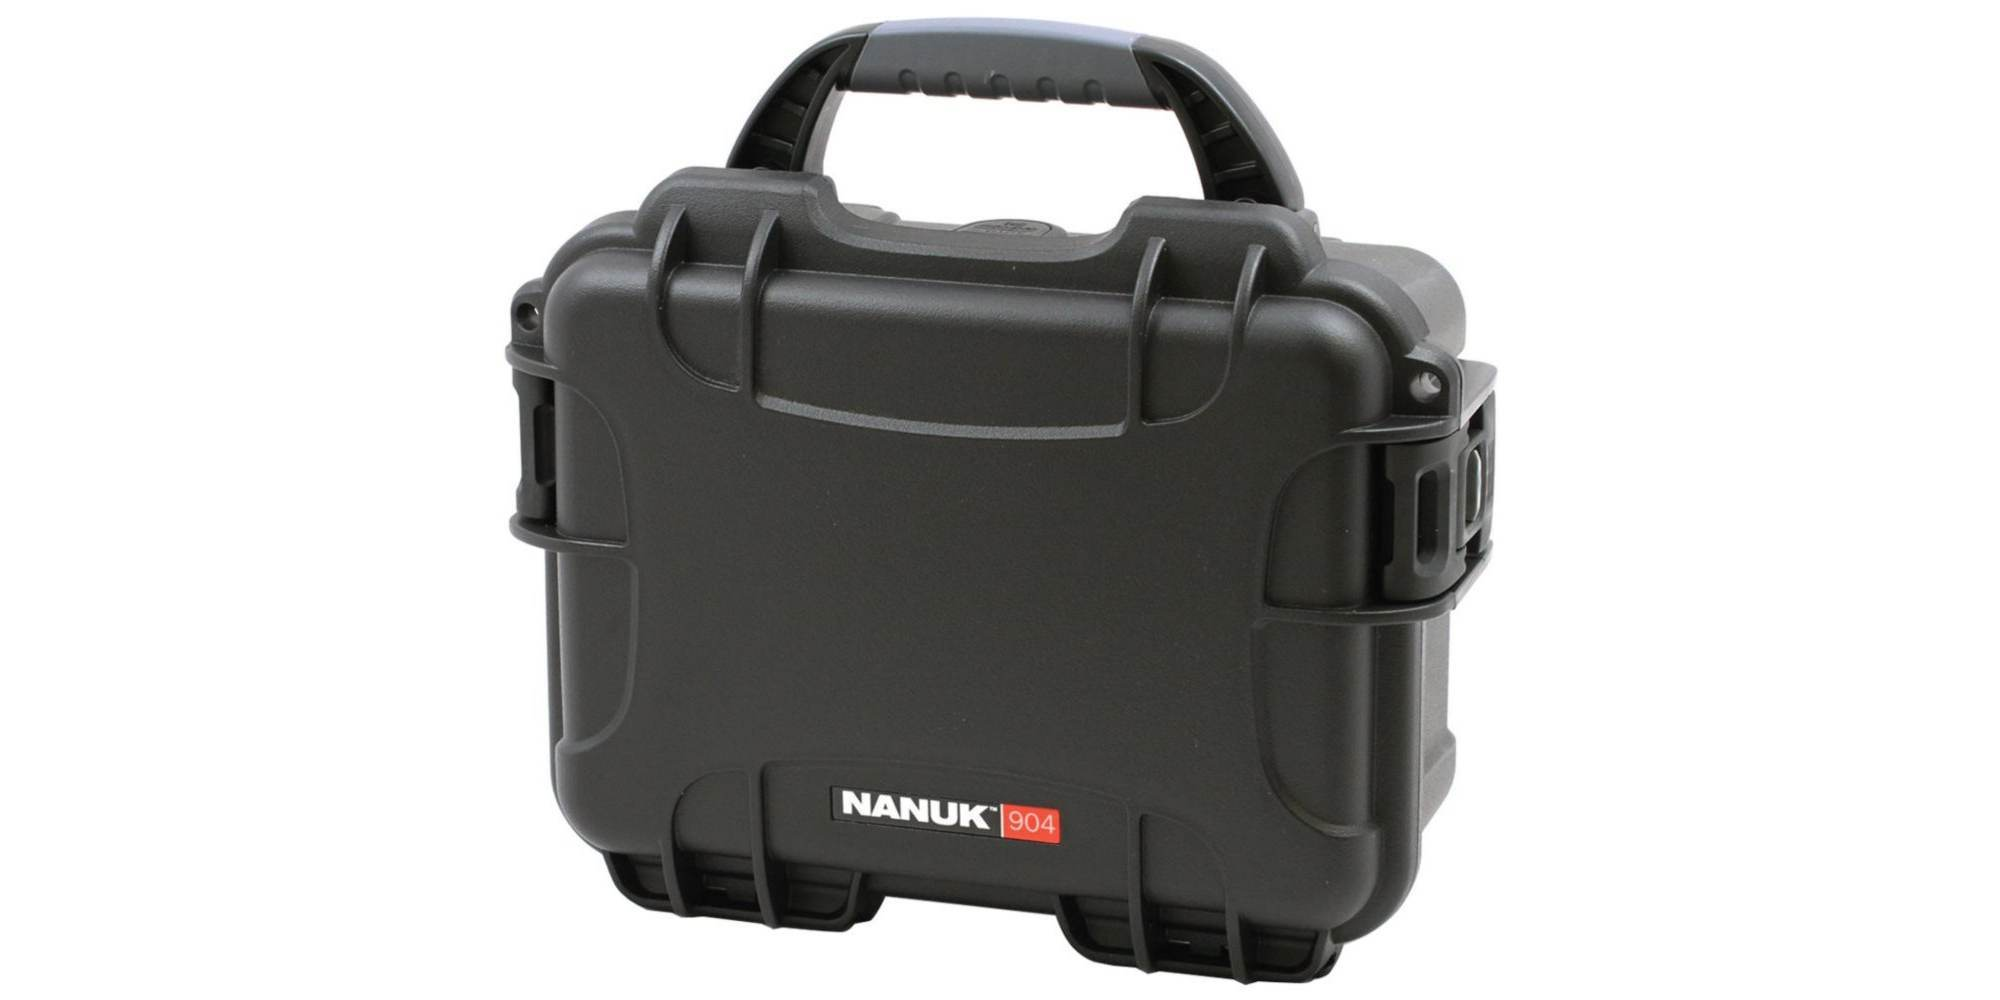 Кейс ударопрочный Nanuk 904 вид сбоку